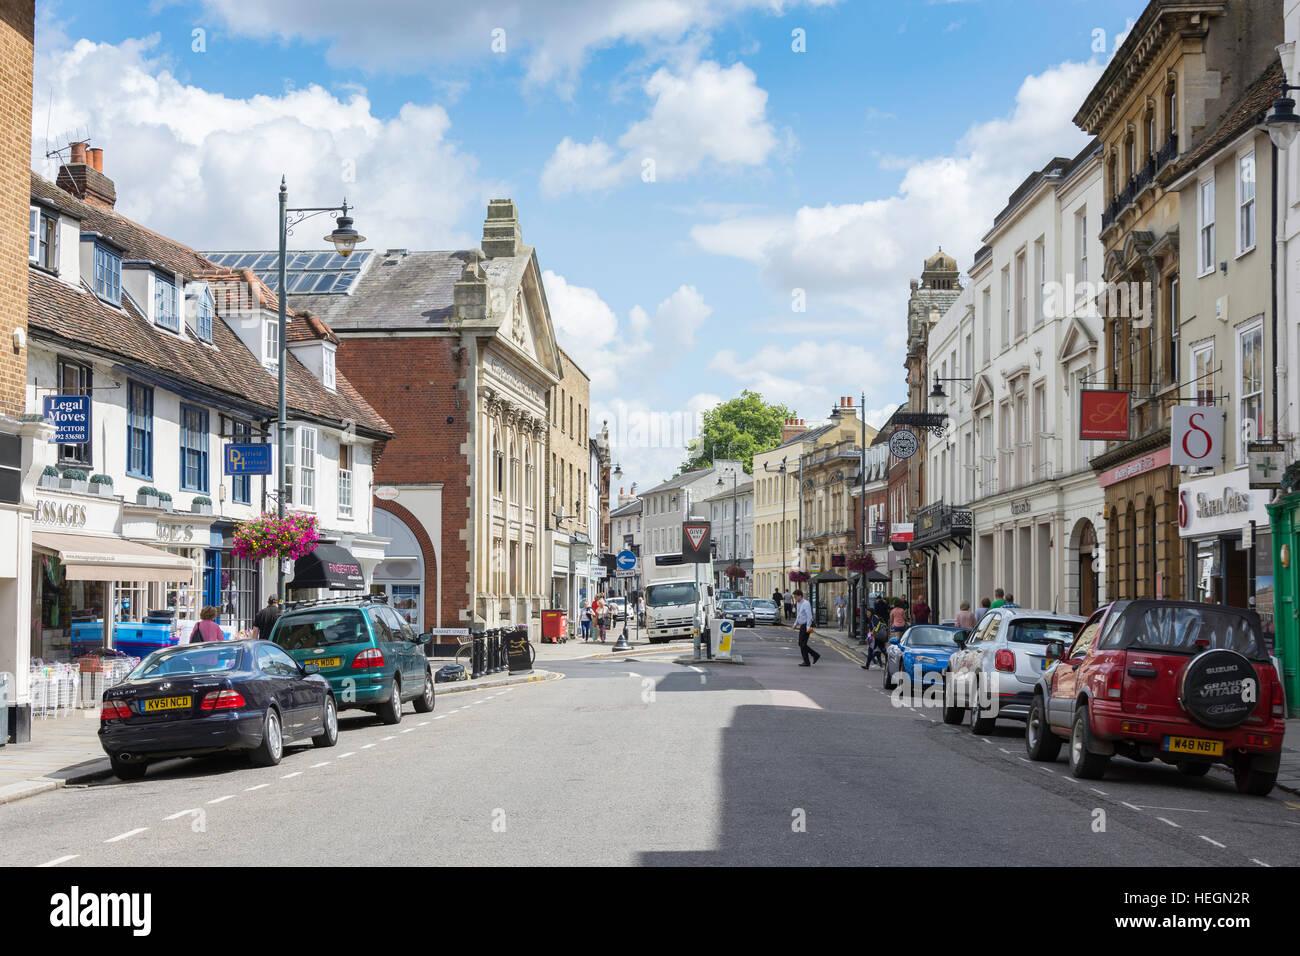 Fore Street, Hertford, Hertfordshire, England, United Kingdom - Stock Image